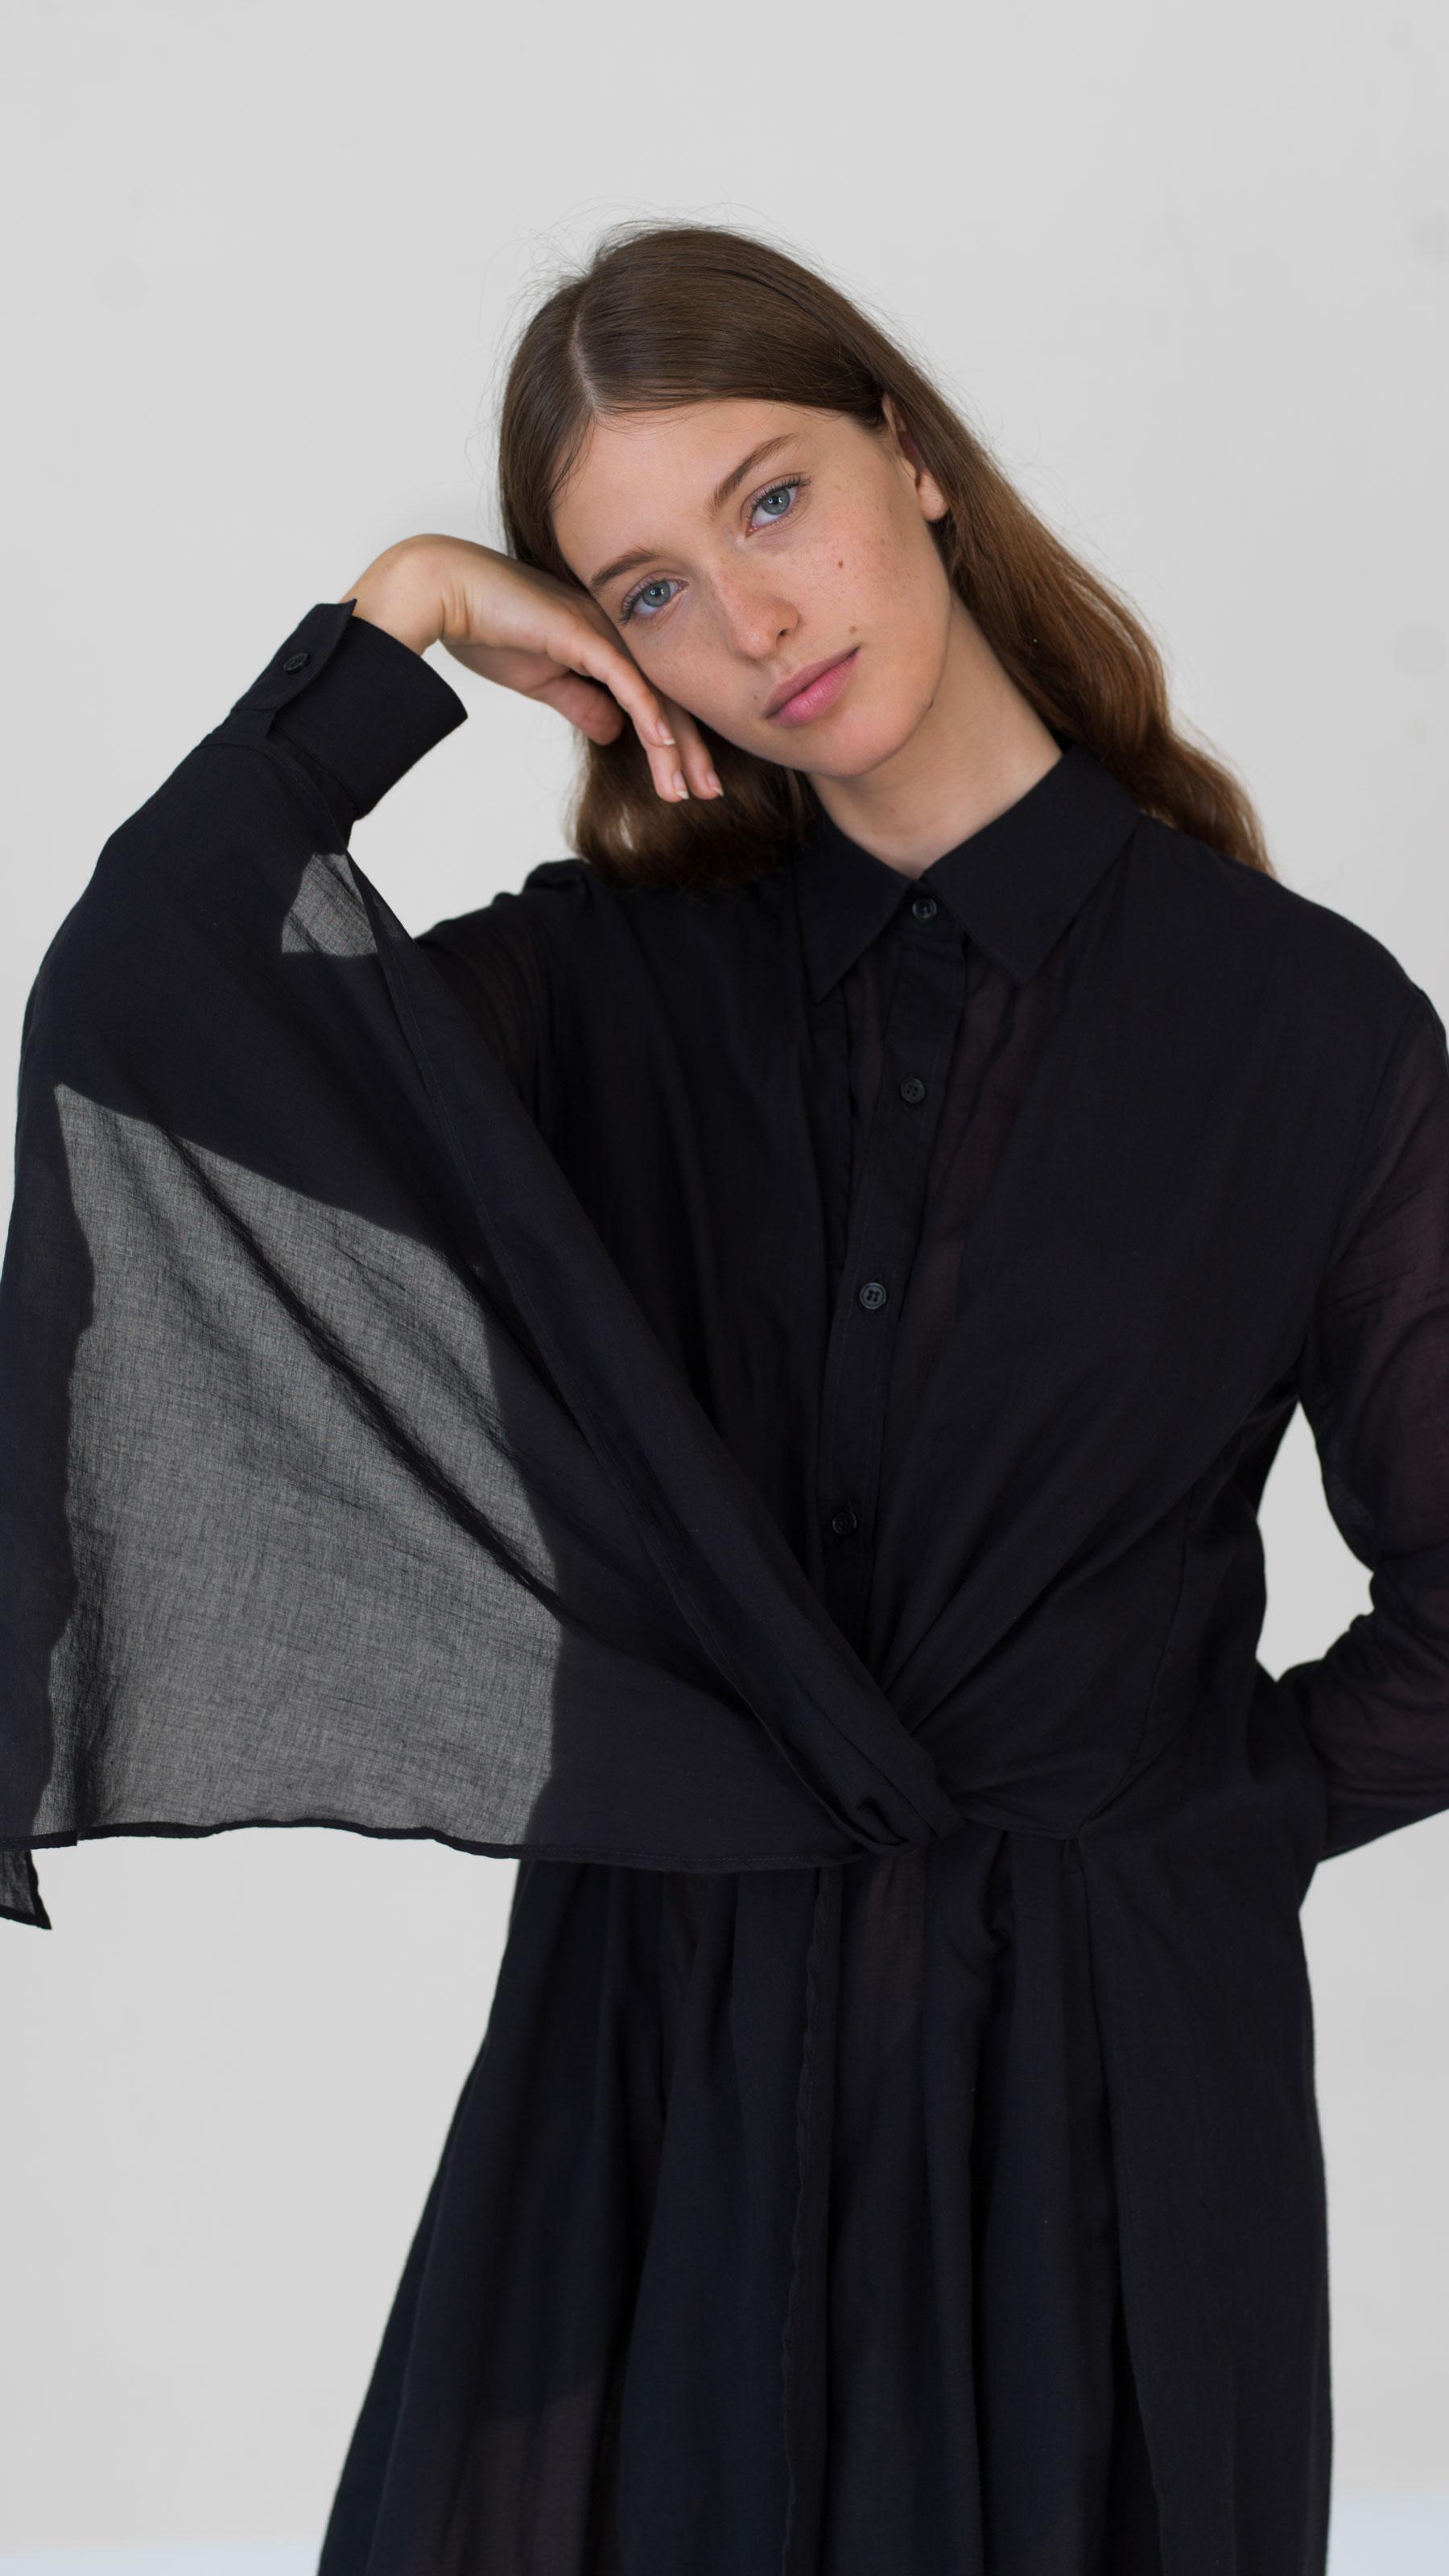 DADA_DIANE_DUCASSE_Dress_Shirt_Knotted_Black_5